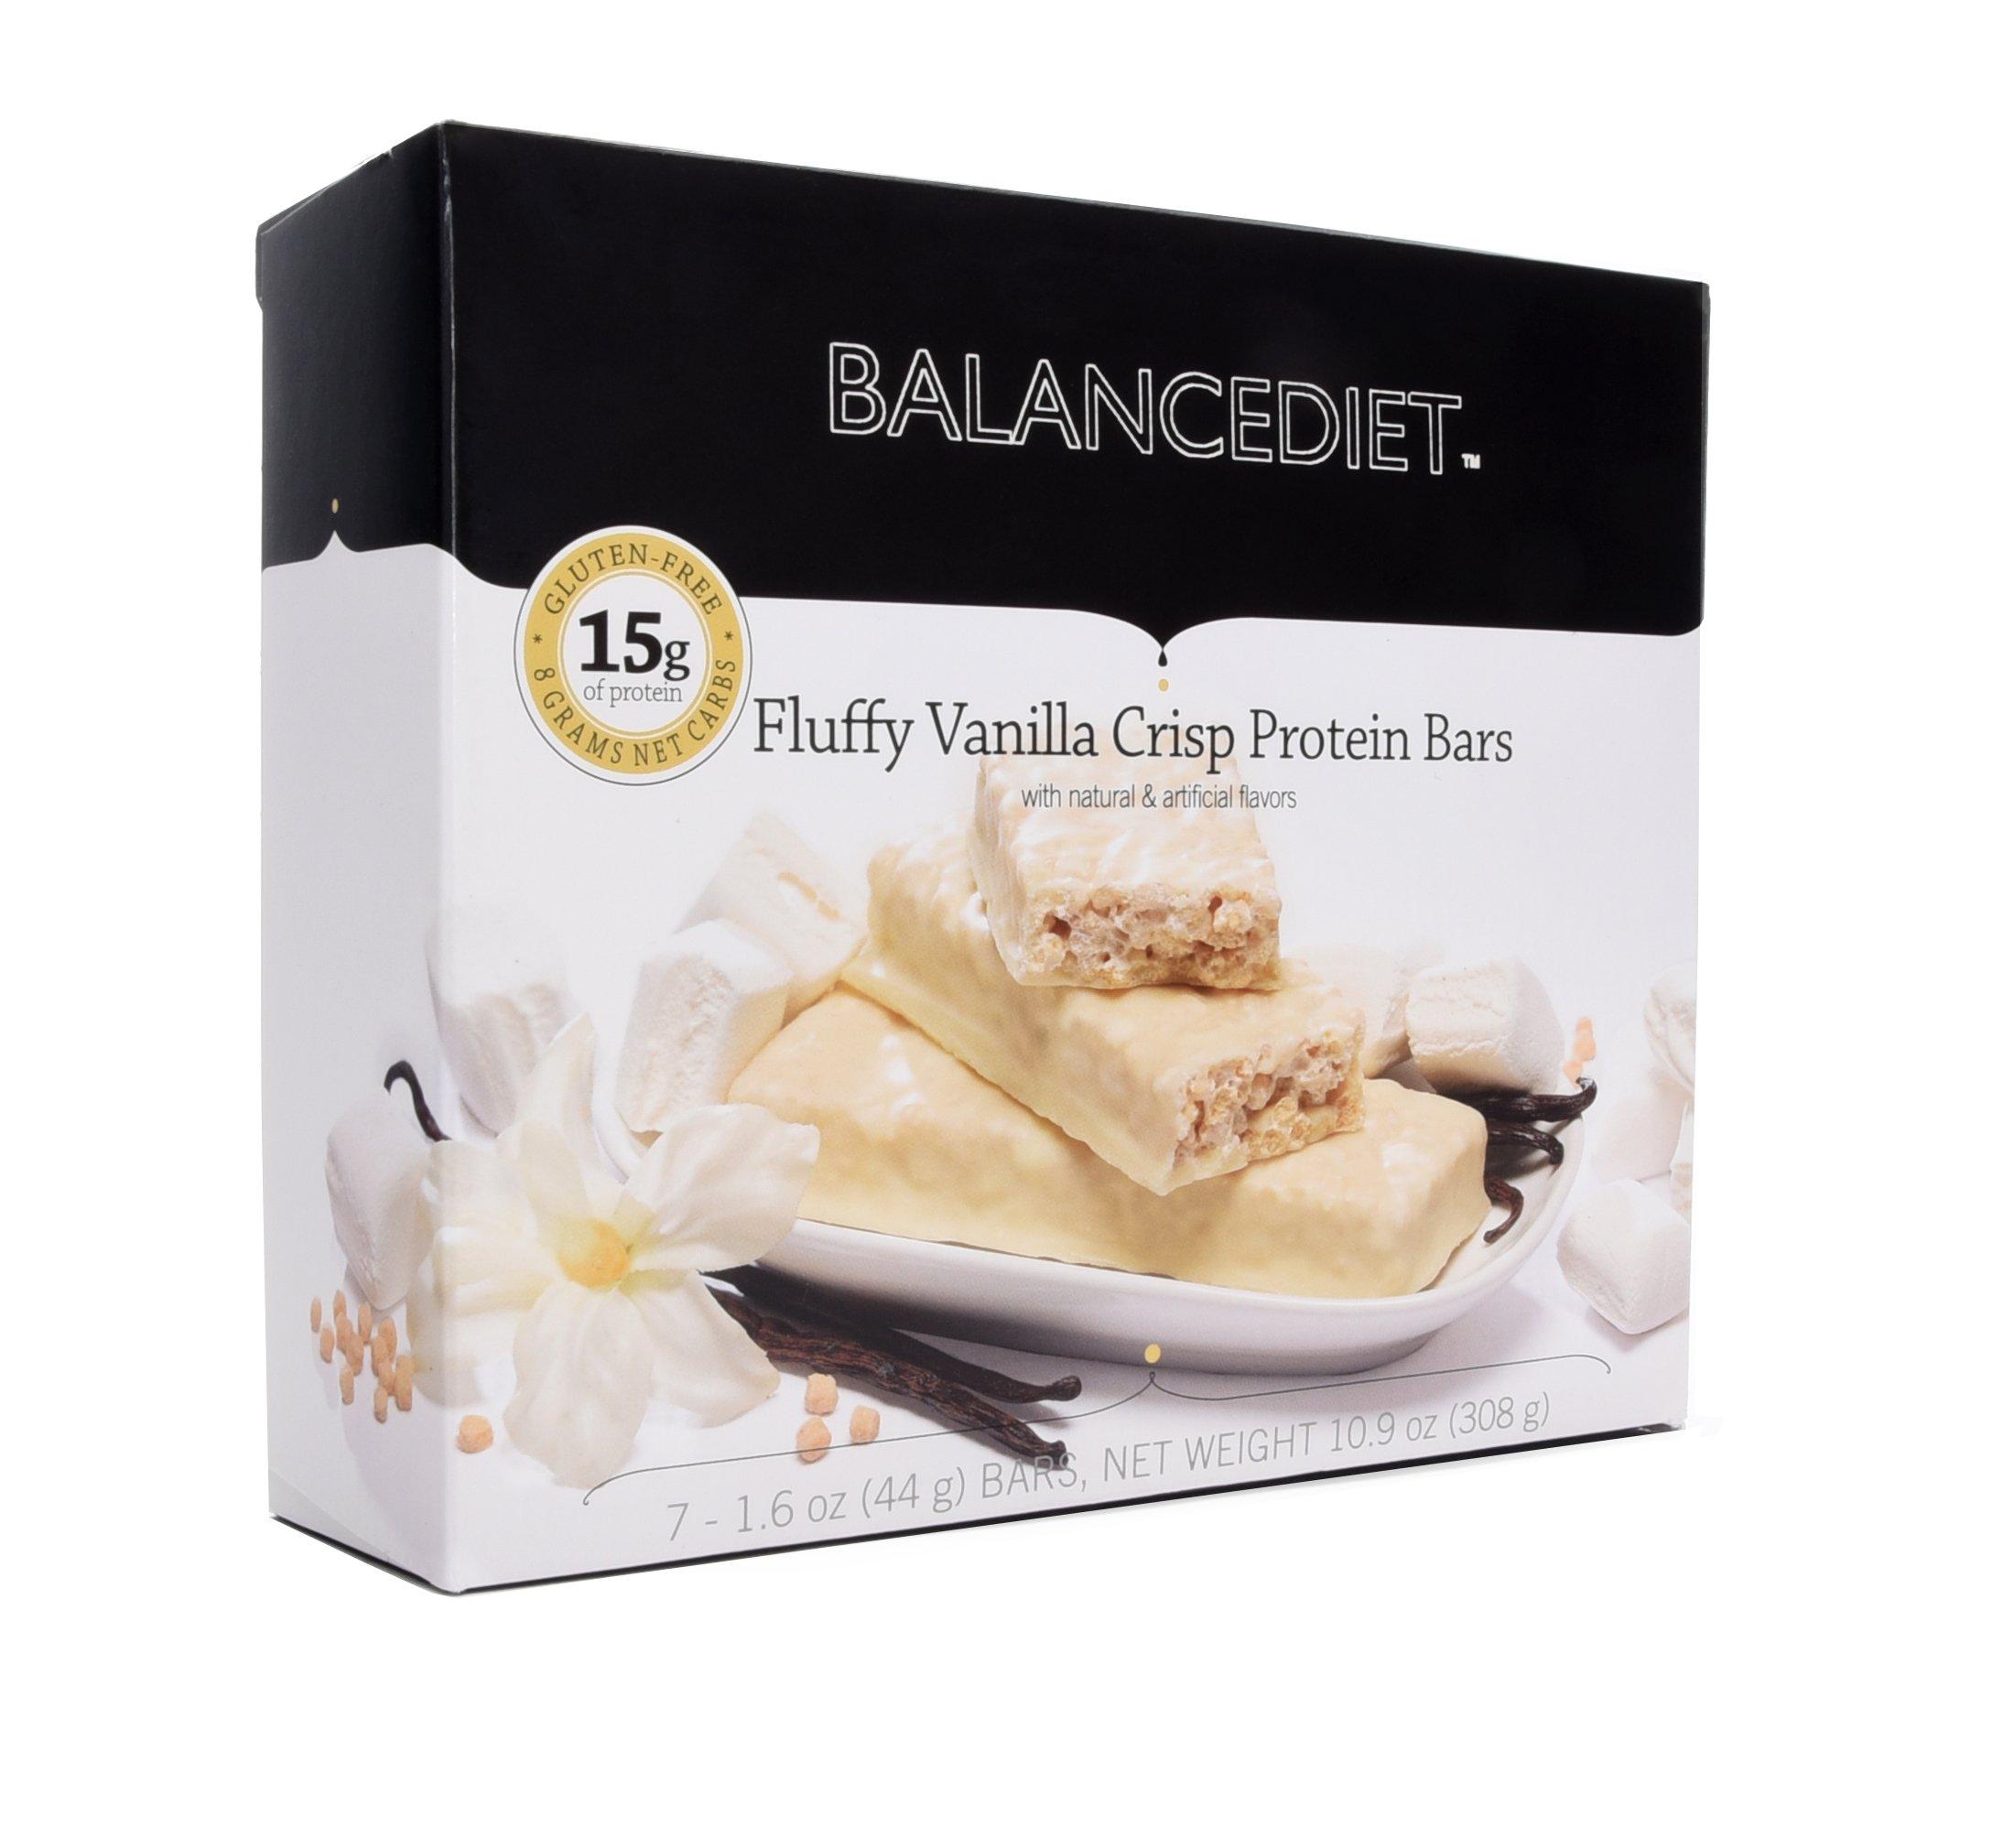 BalanceDietTM | Protein Bar | 15g of Protein | Low Carb | 7 Bar Box (Fluffy Vanilla Crisp) by BalanceDiet